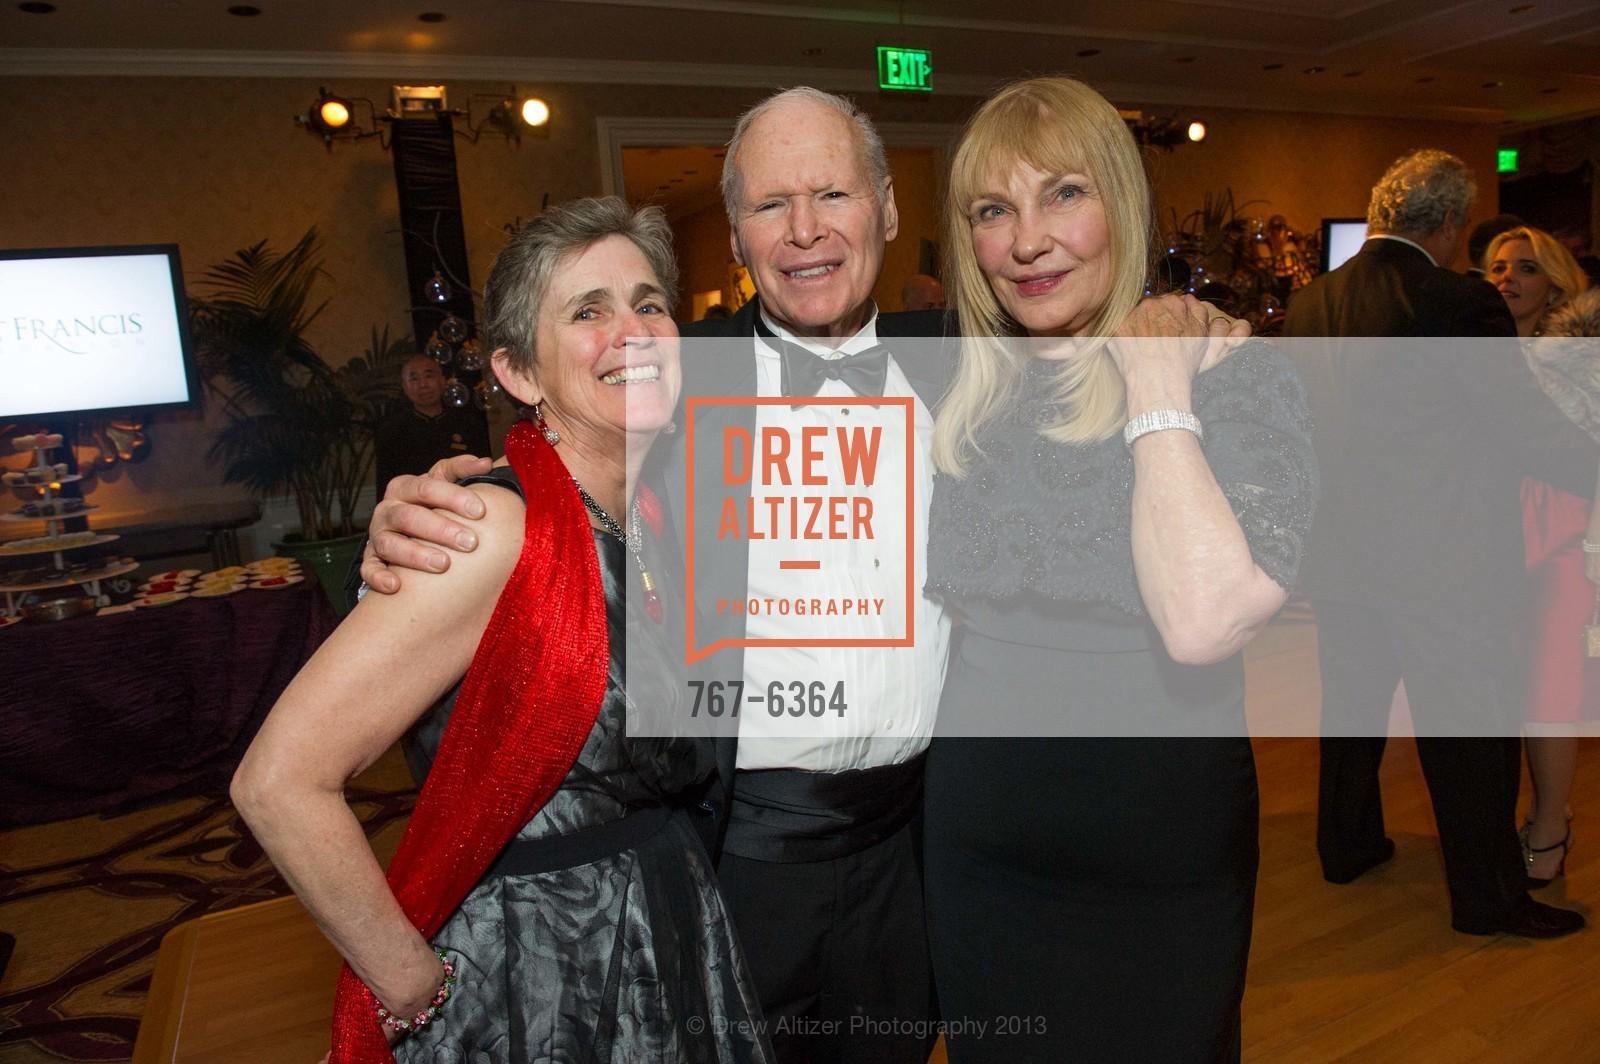 Joan Watson, 25th Anniversary Holiday HOB NOB ON THE HILL, US, December 6th, 2013